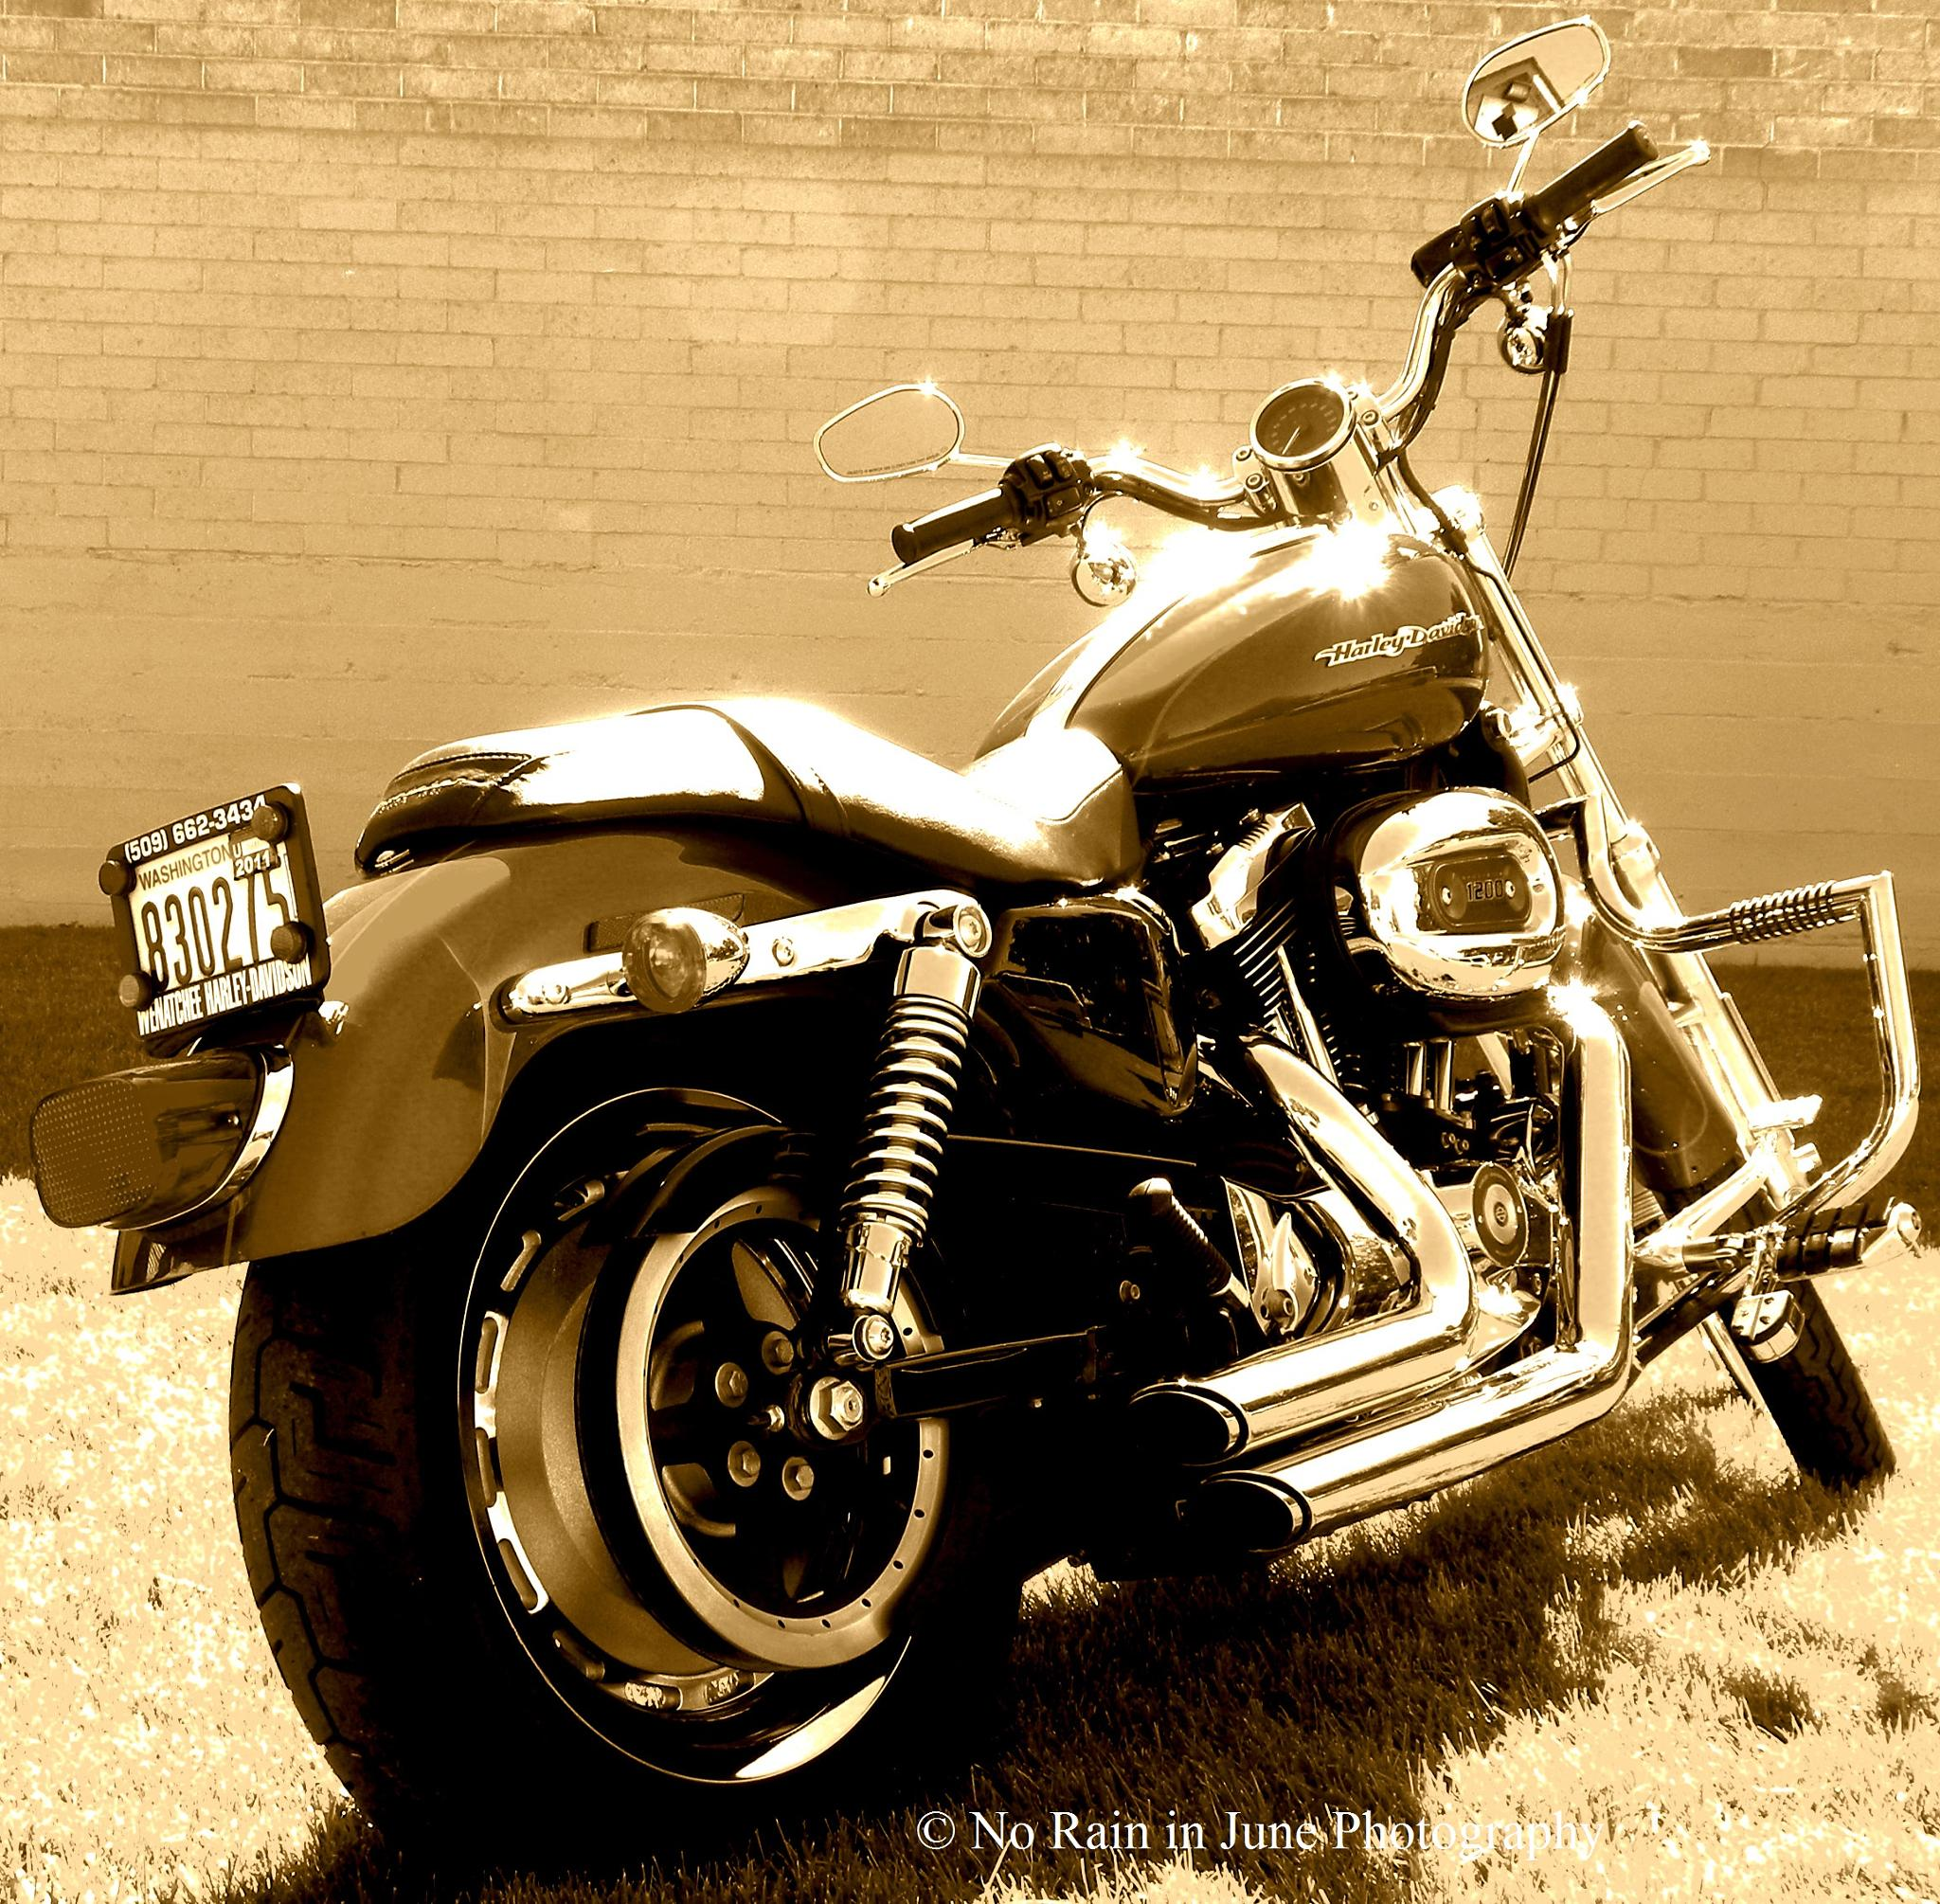 Her Harley by nicki.jennings